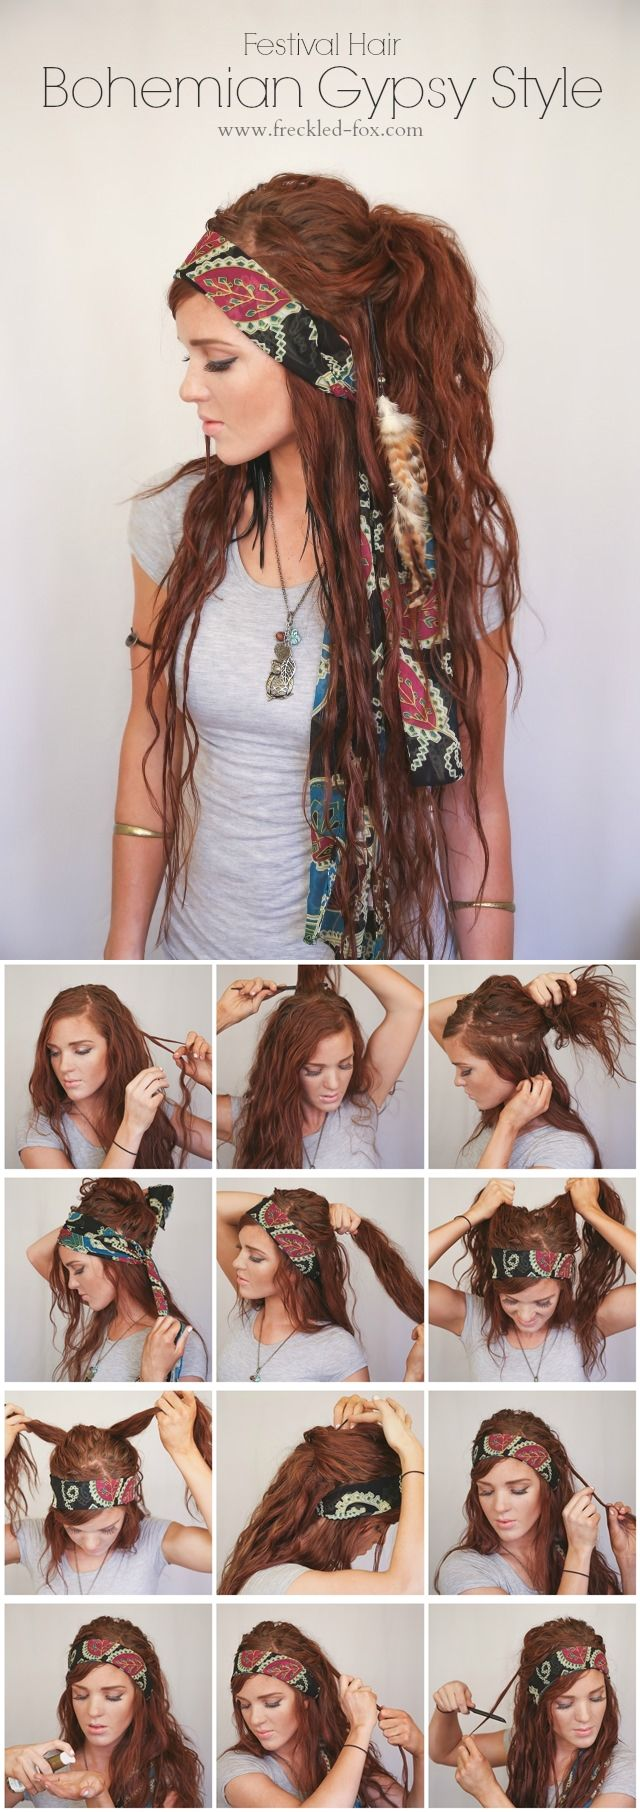 10 boho hair tutorial for the season pretty designs 10 boho hair tutorial for the season baditri Choice Image